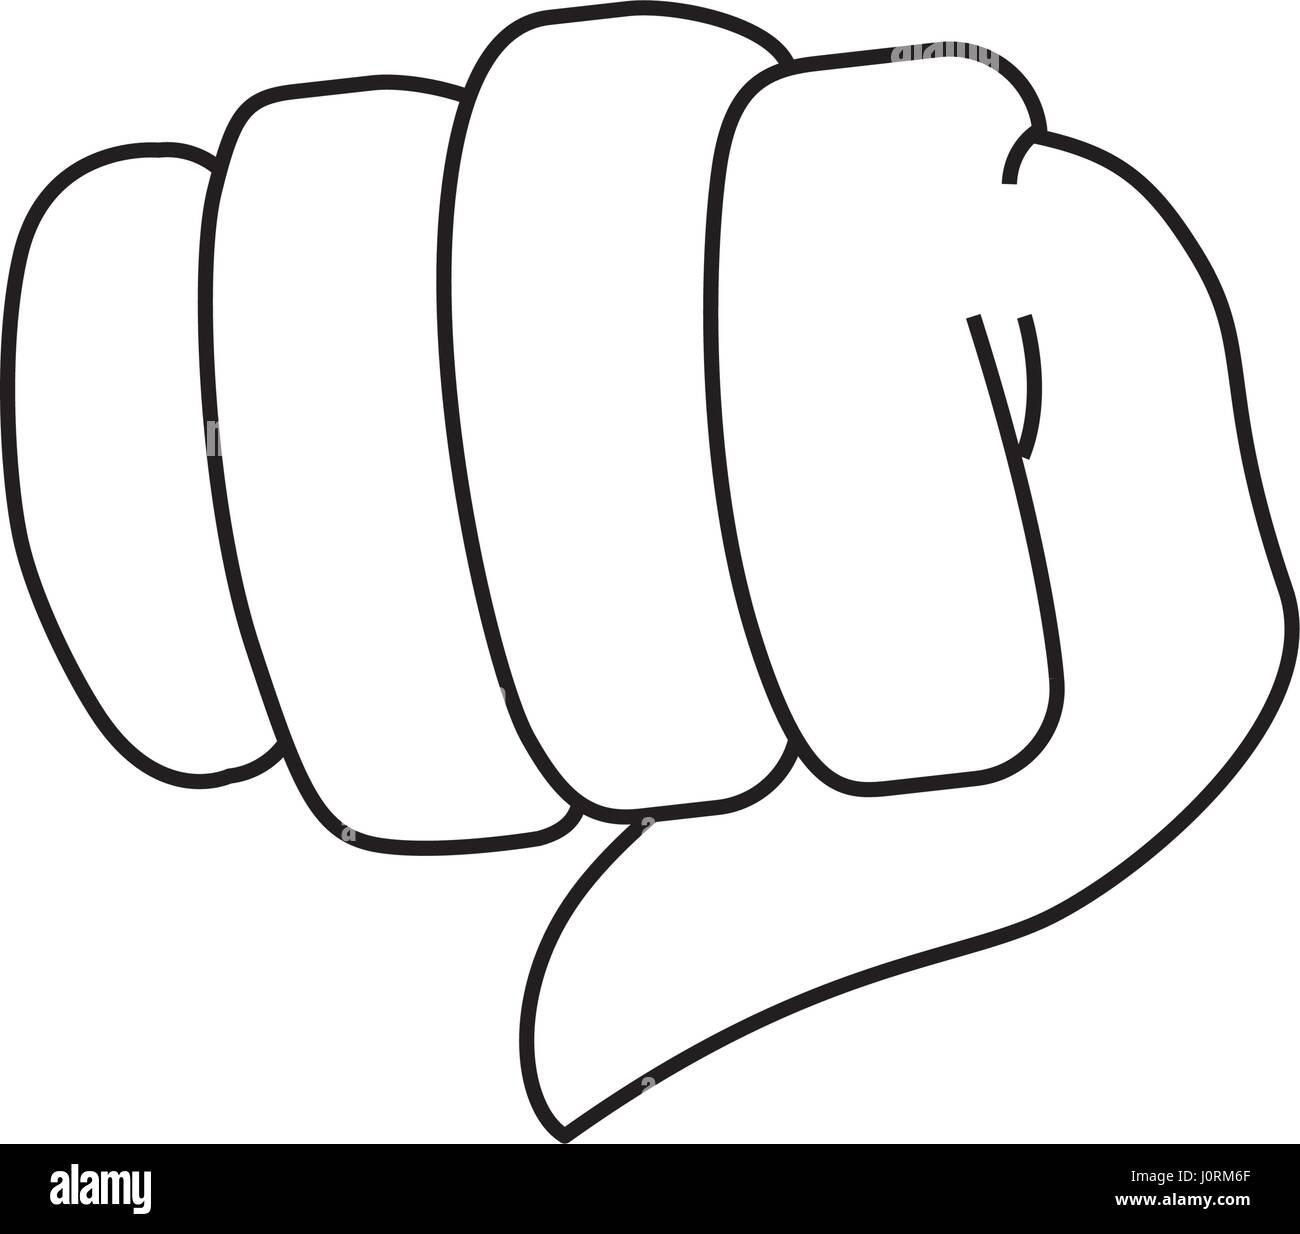 Fist hand symbol stock image